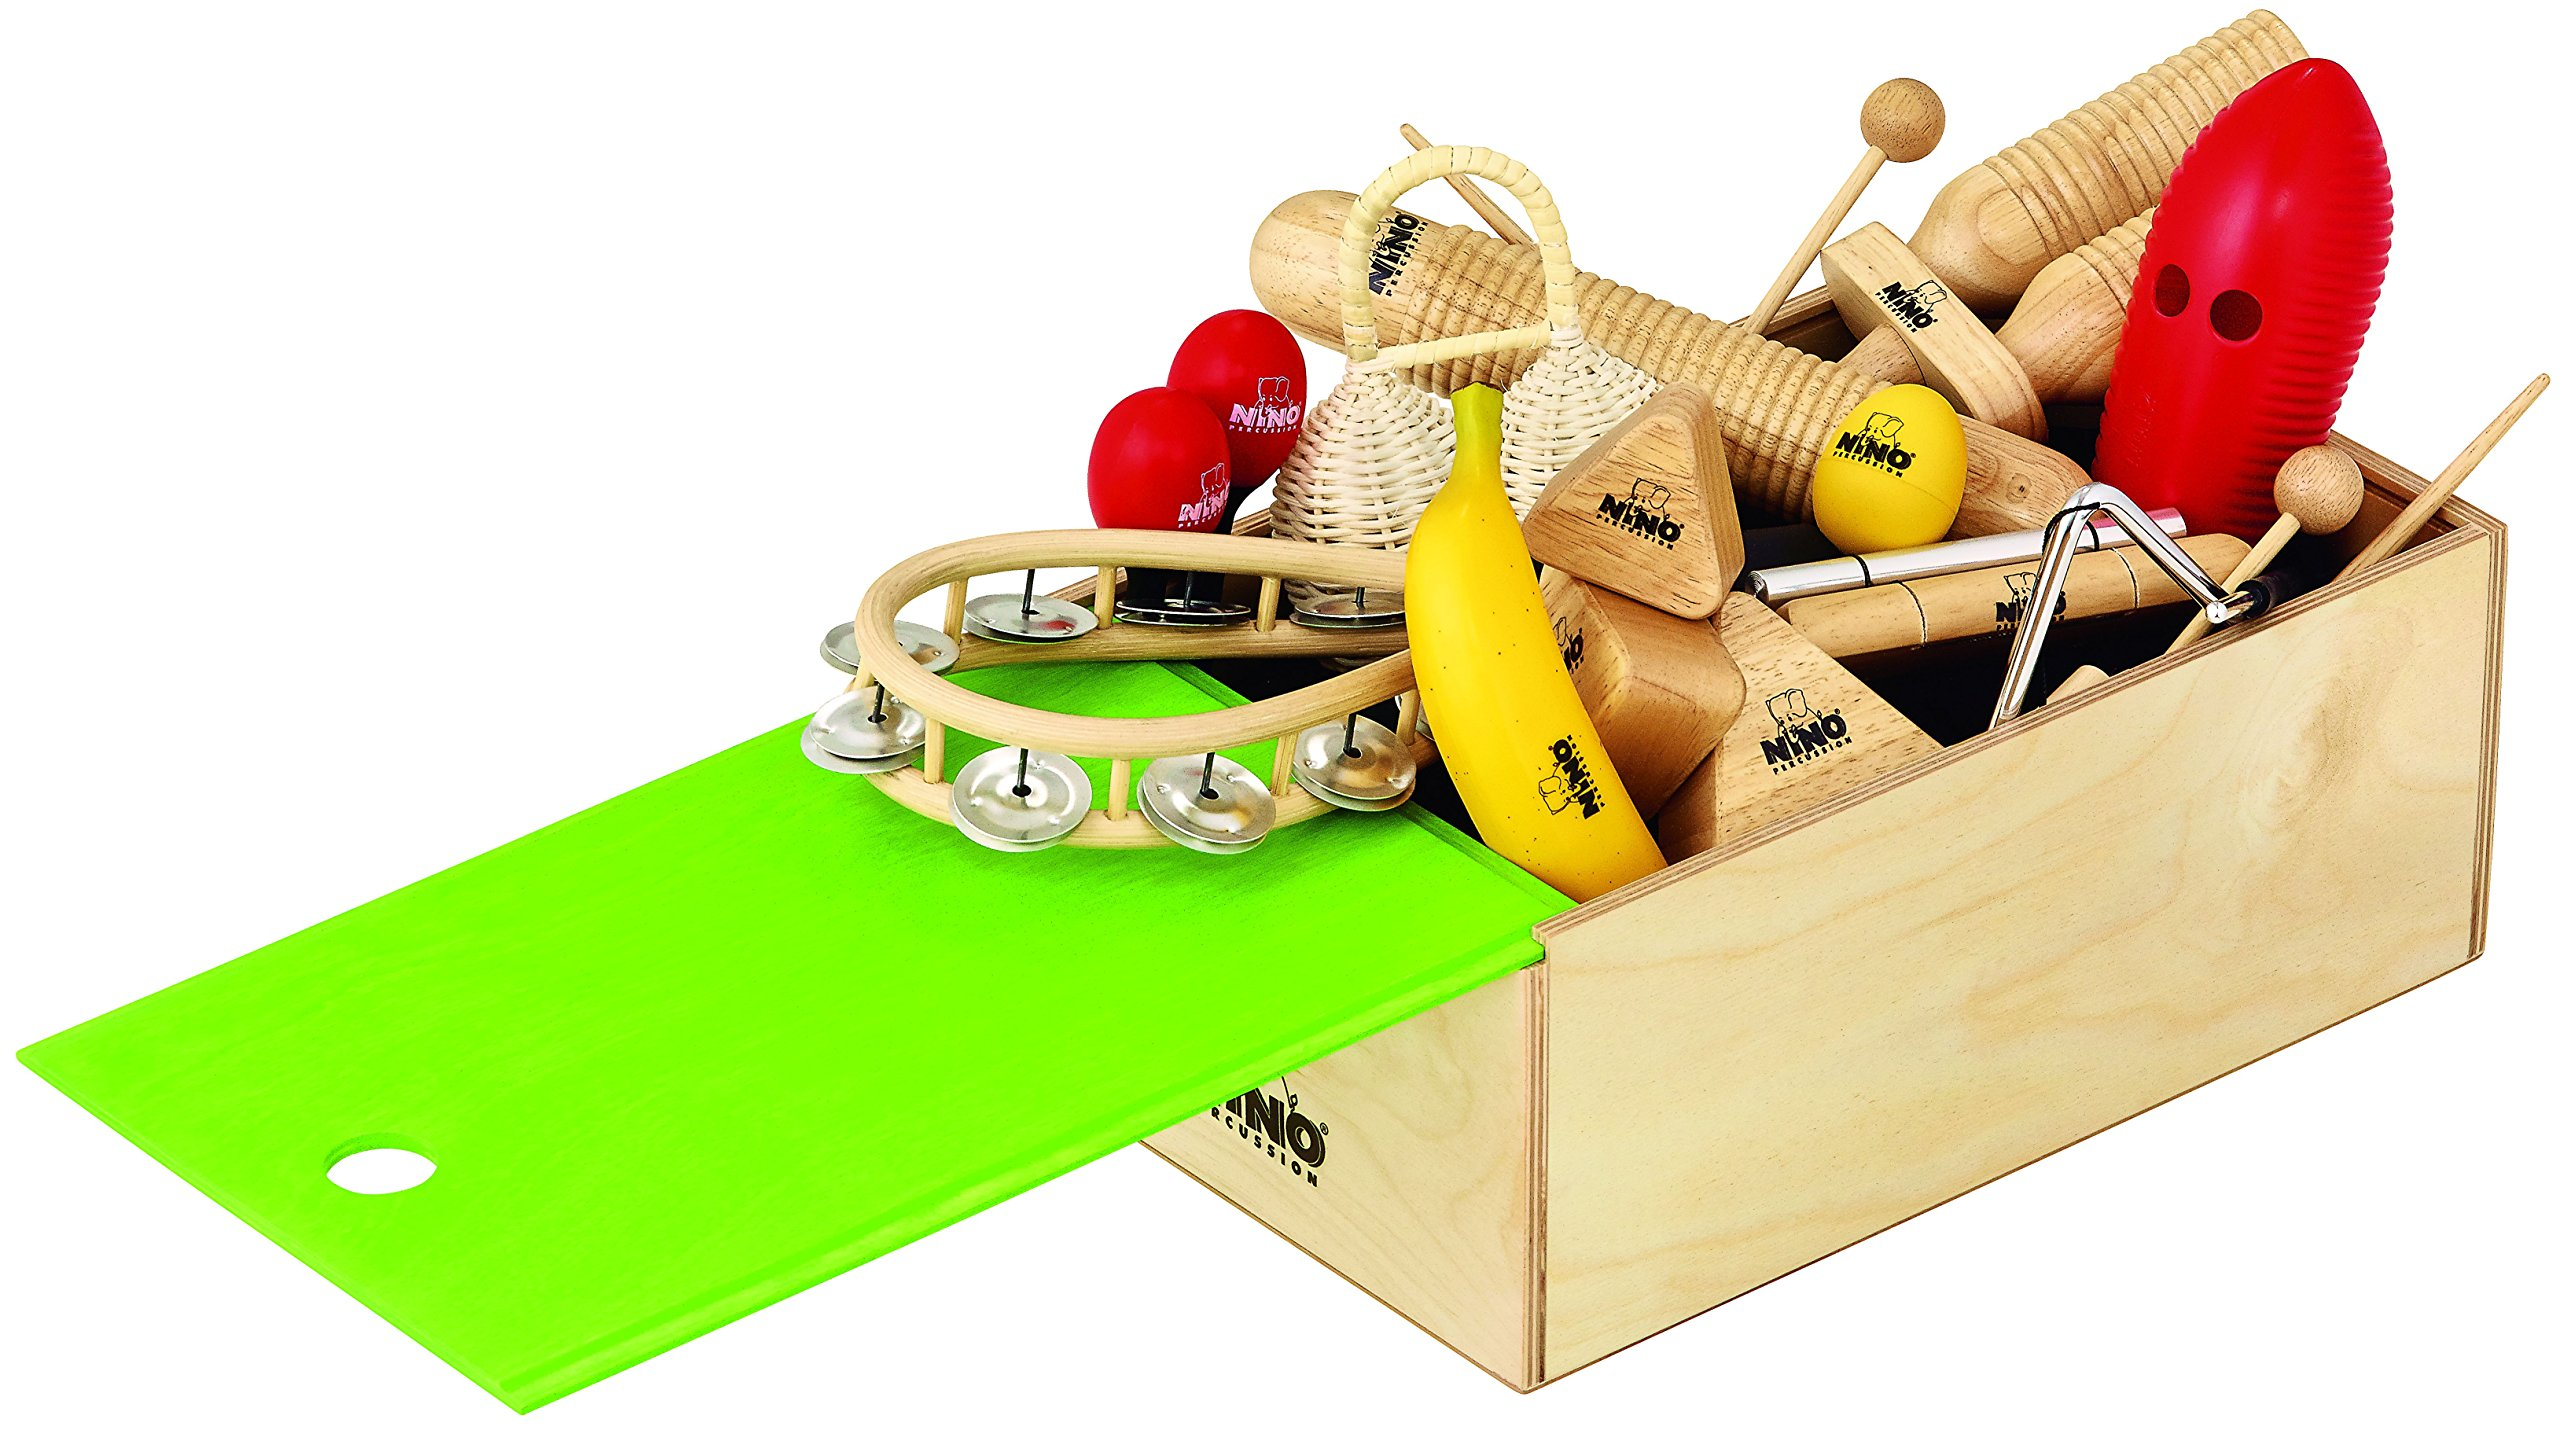 Nino Percussion NINOSET515-WB Rhythm Assortment with Storage Box, 15 pieces